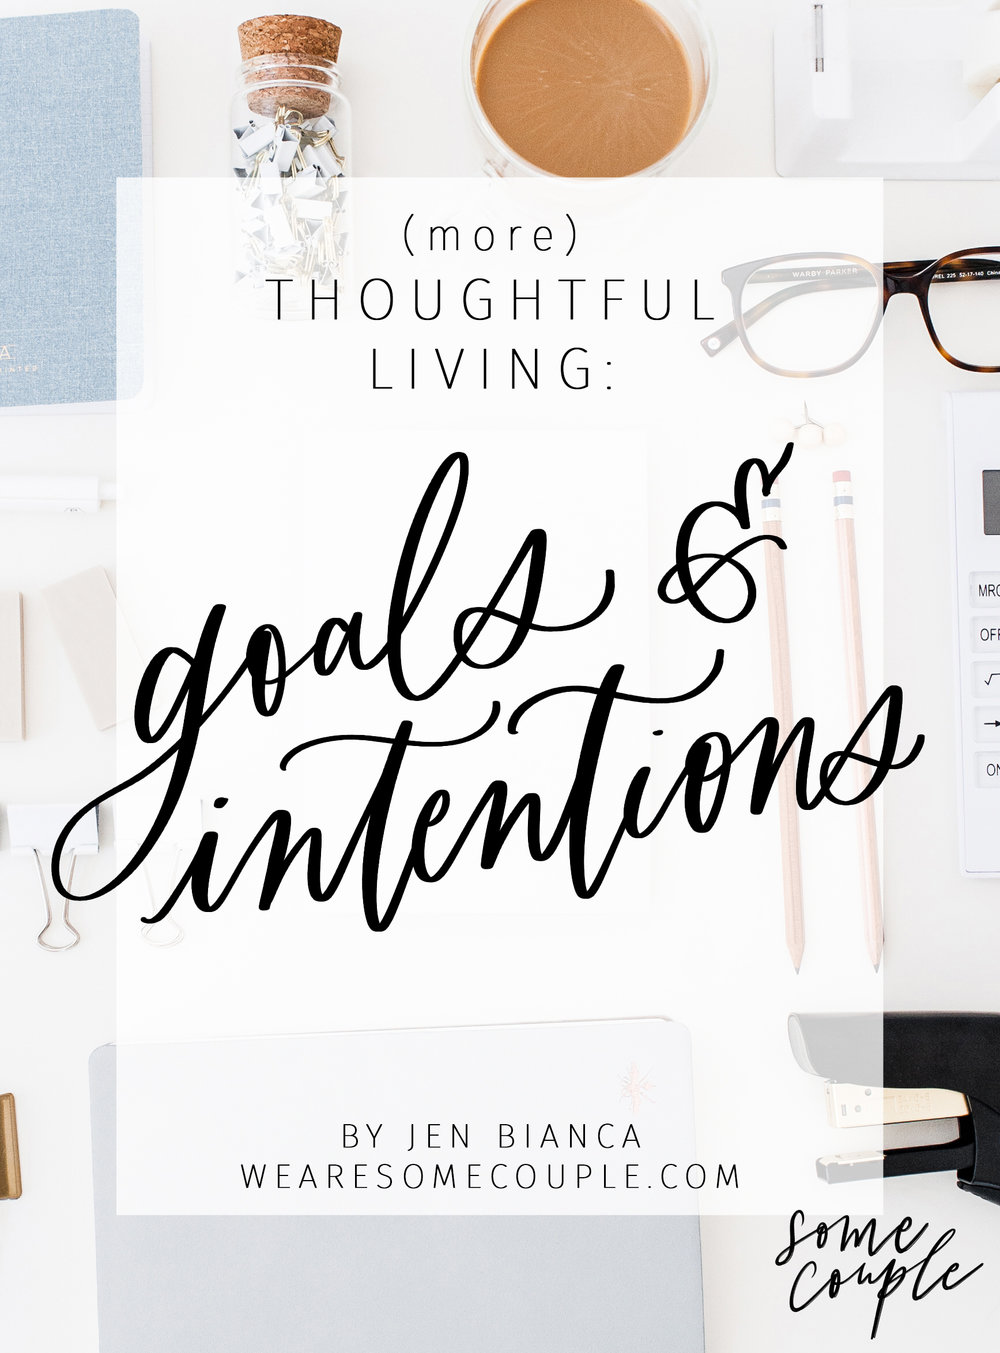 Goals and Intentions by Jennifer Siemens of wearesomecouple.com